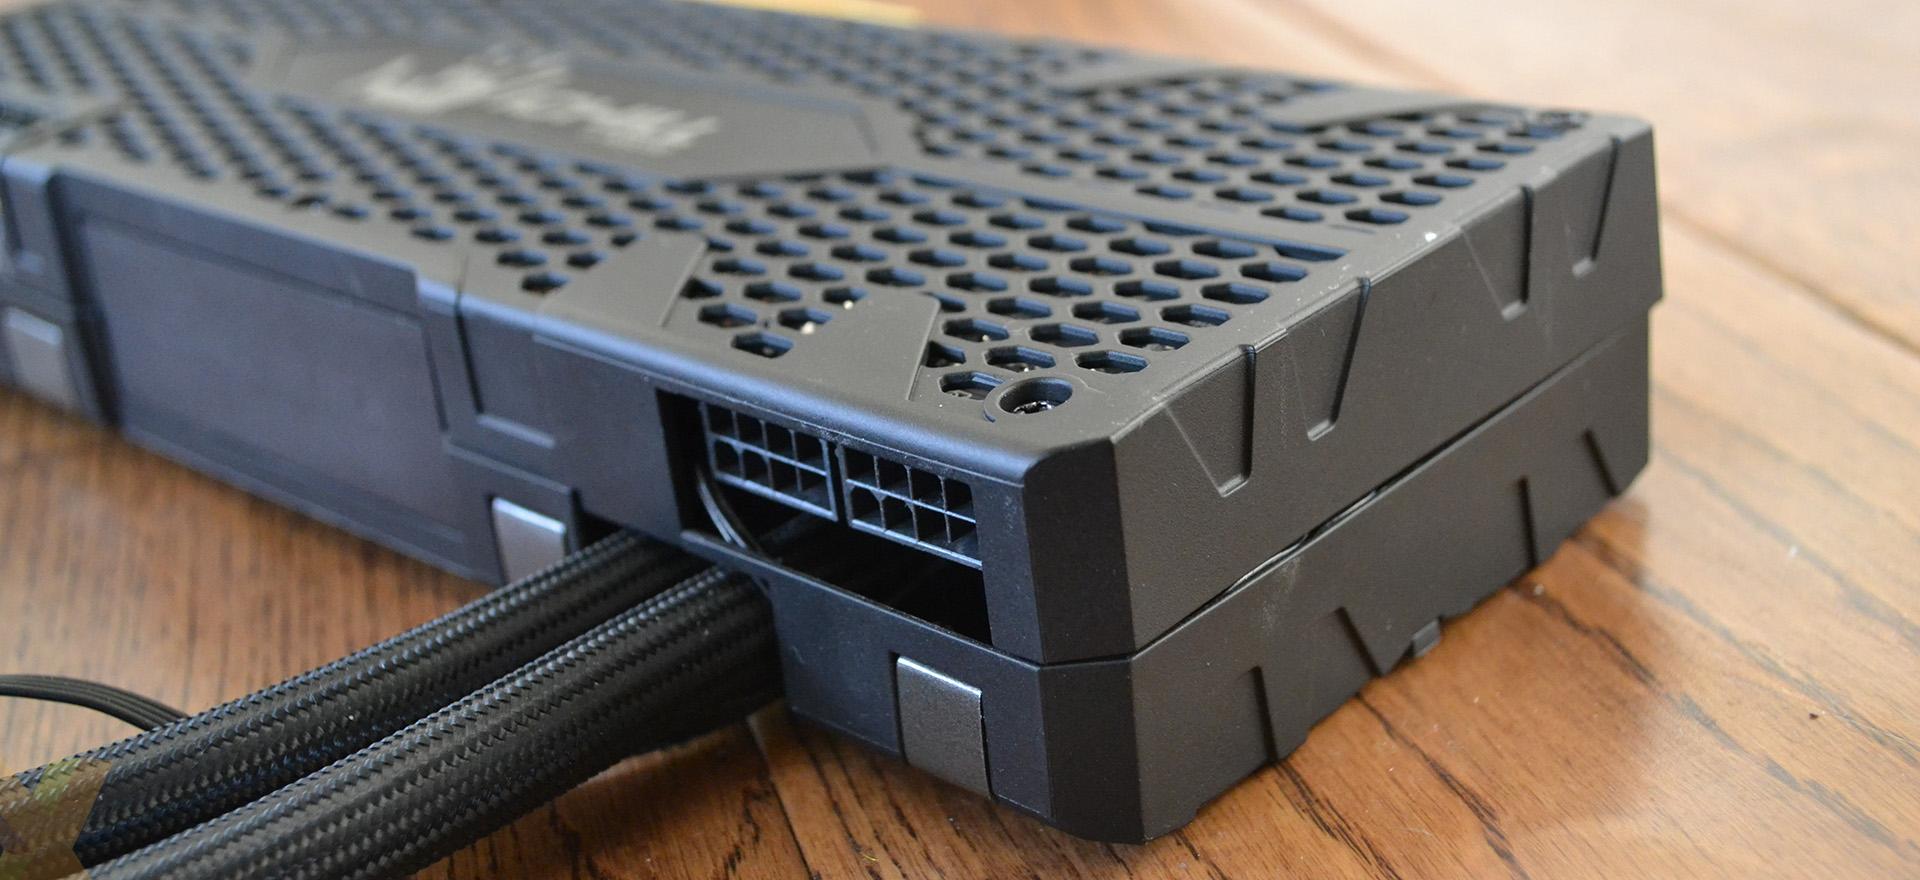 Review: Inno3D GeForce RTX 2080 Ti iChiLL Black - Graphics